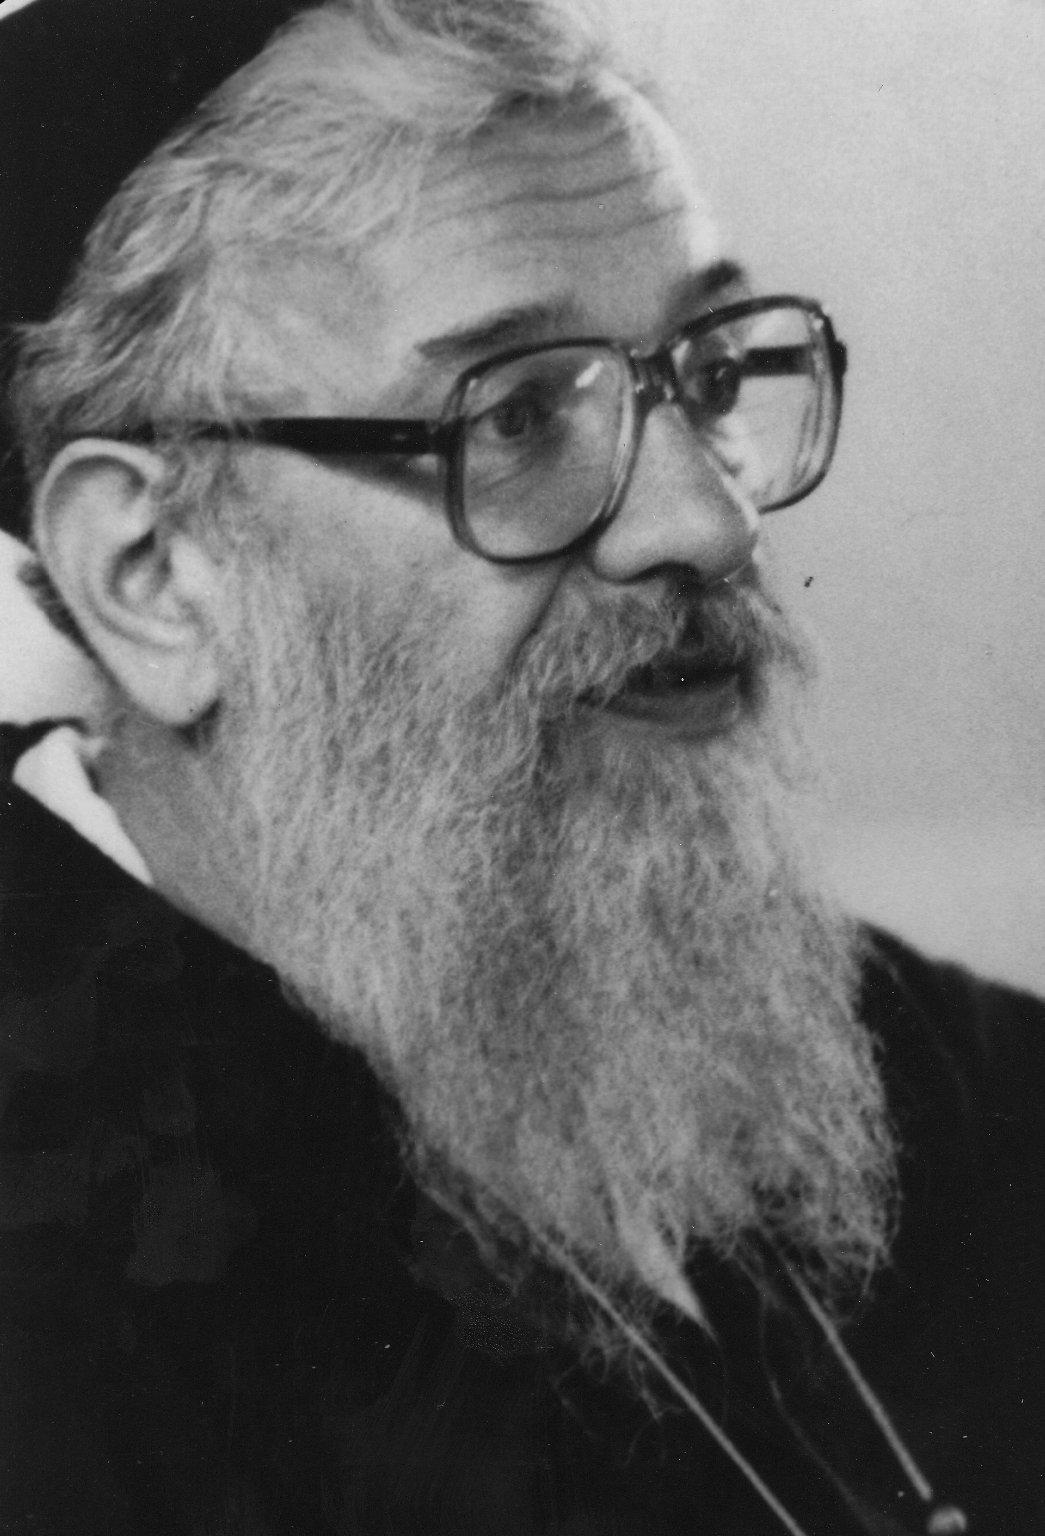 Rabbi Zalman Schachter, ca. 1980s.